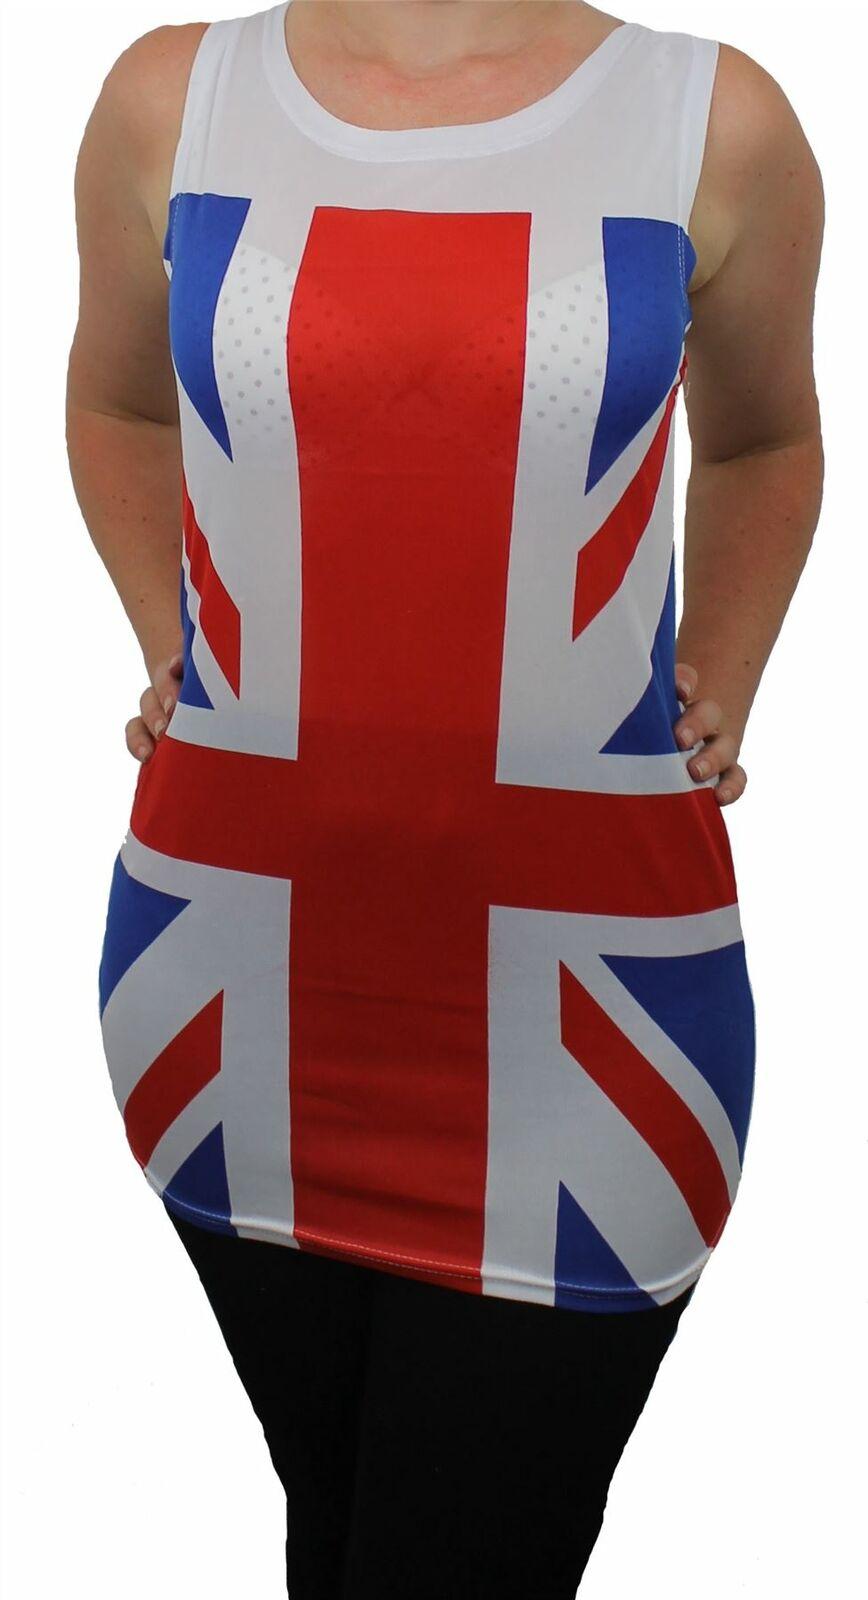 FAULTY UNION JACK VEST UNITED KINGDOM BRITISH ROYAL JUBILEE T-SHIRT FANCY DRESS